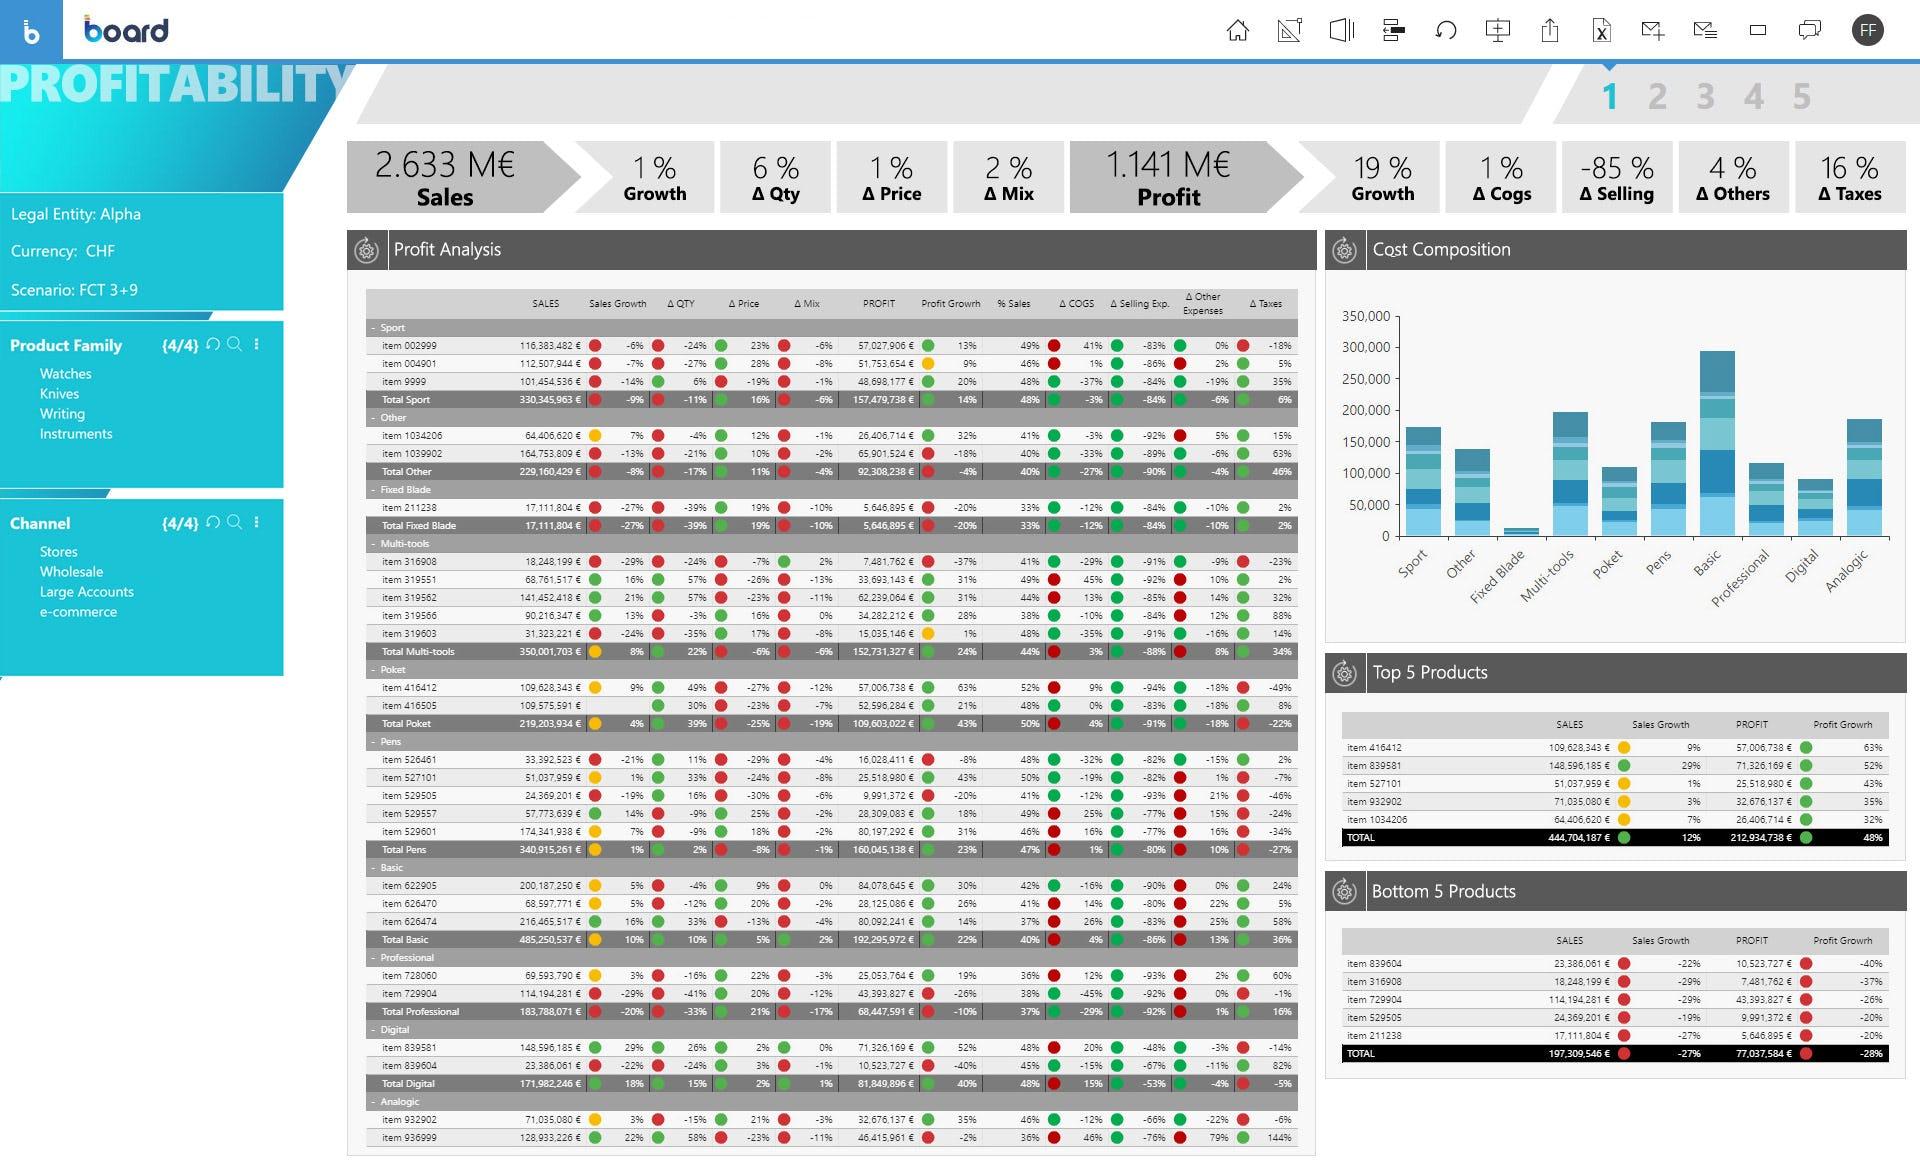 BOARD Software - Profitability